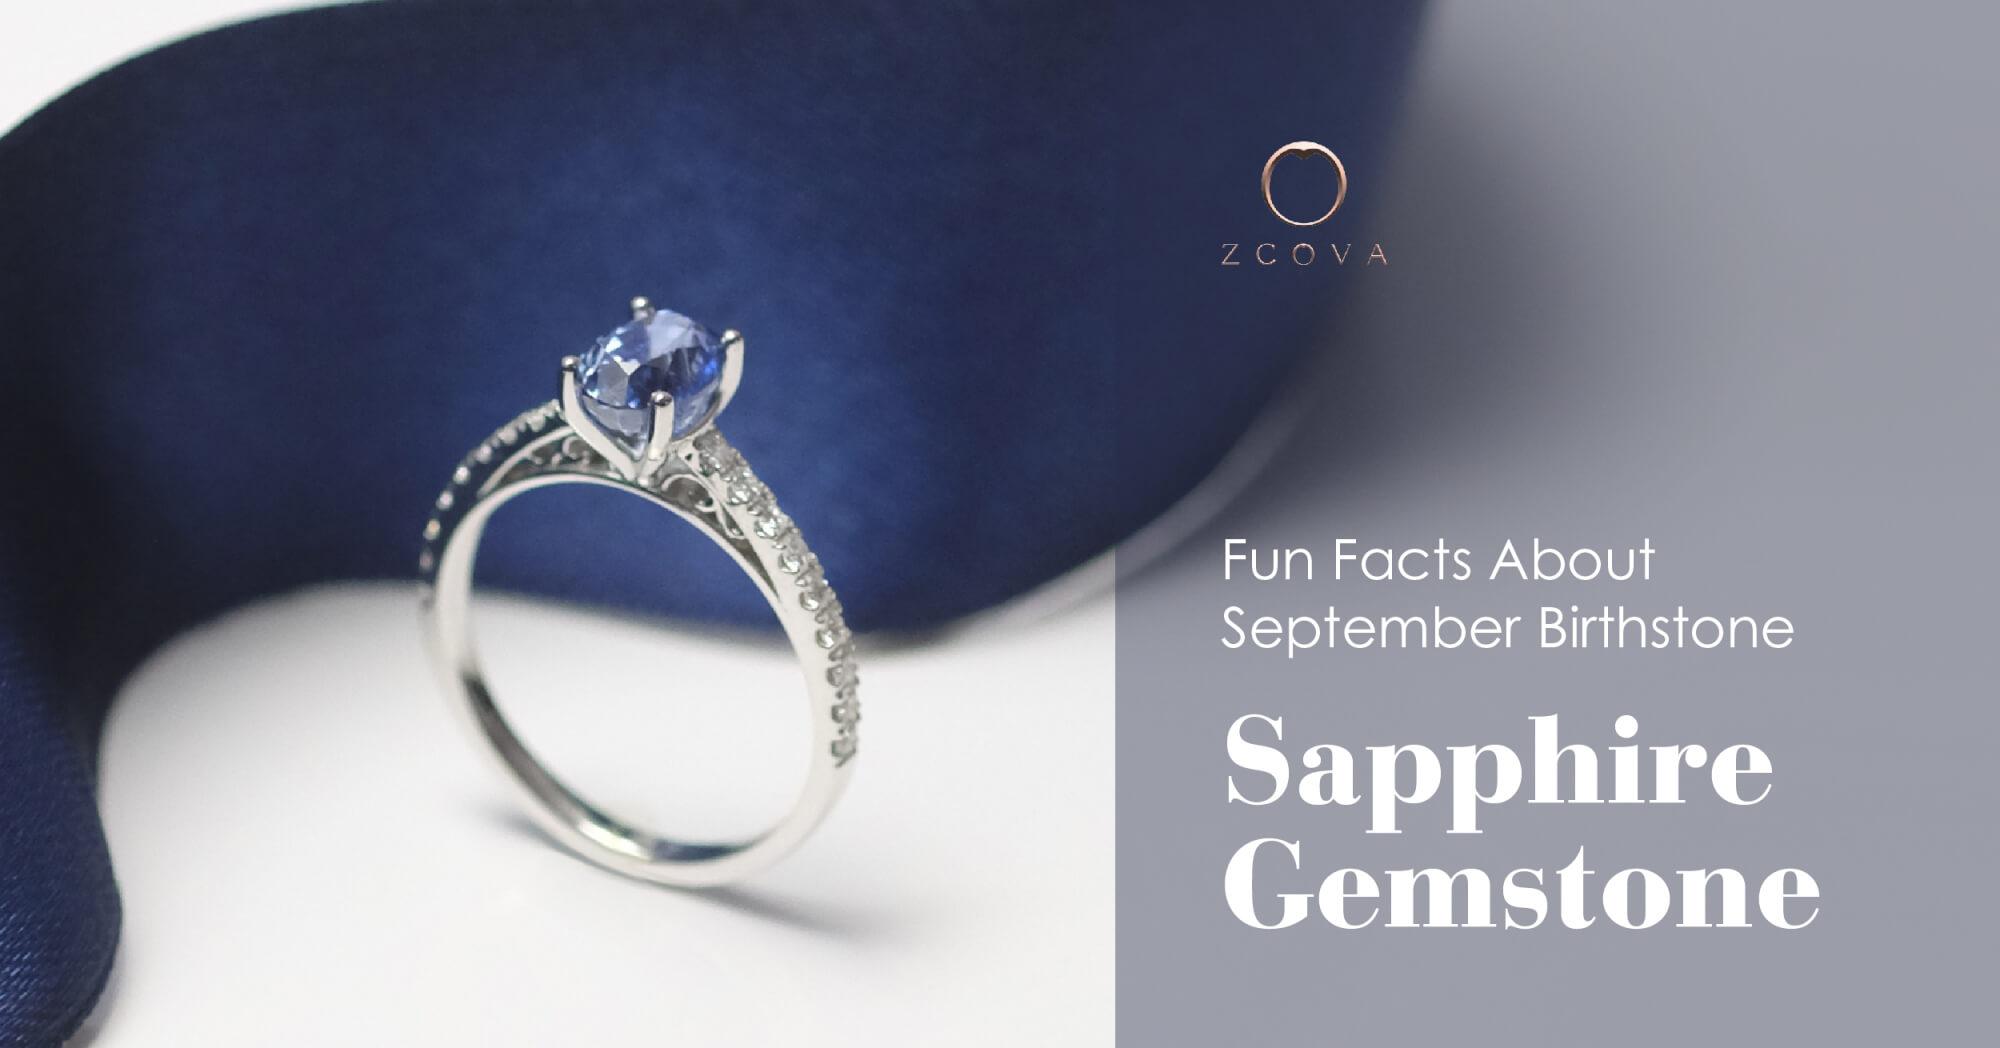 September birthstone Sapphire gemstone facts